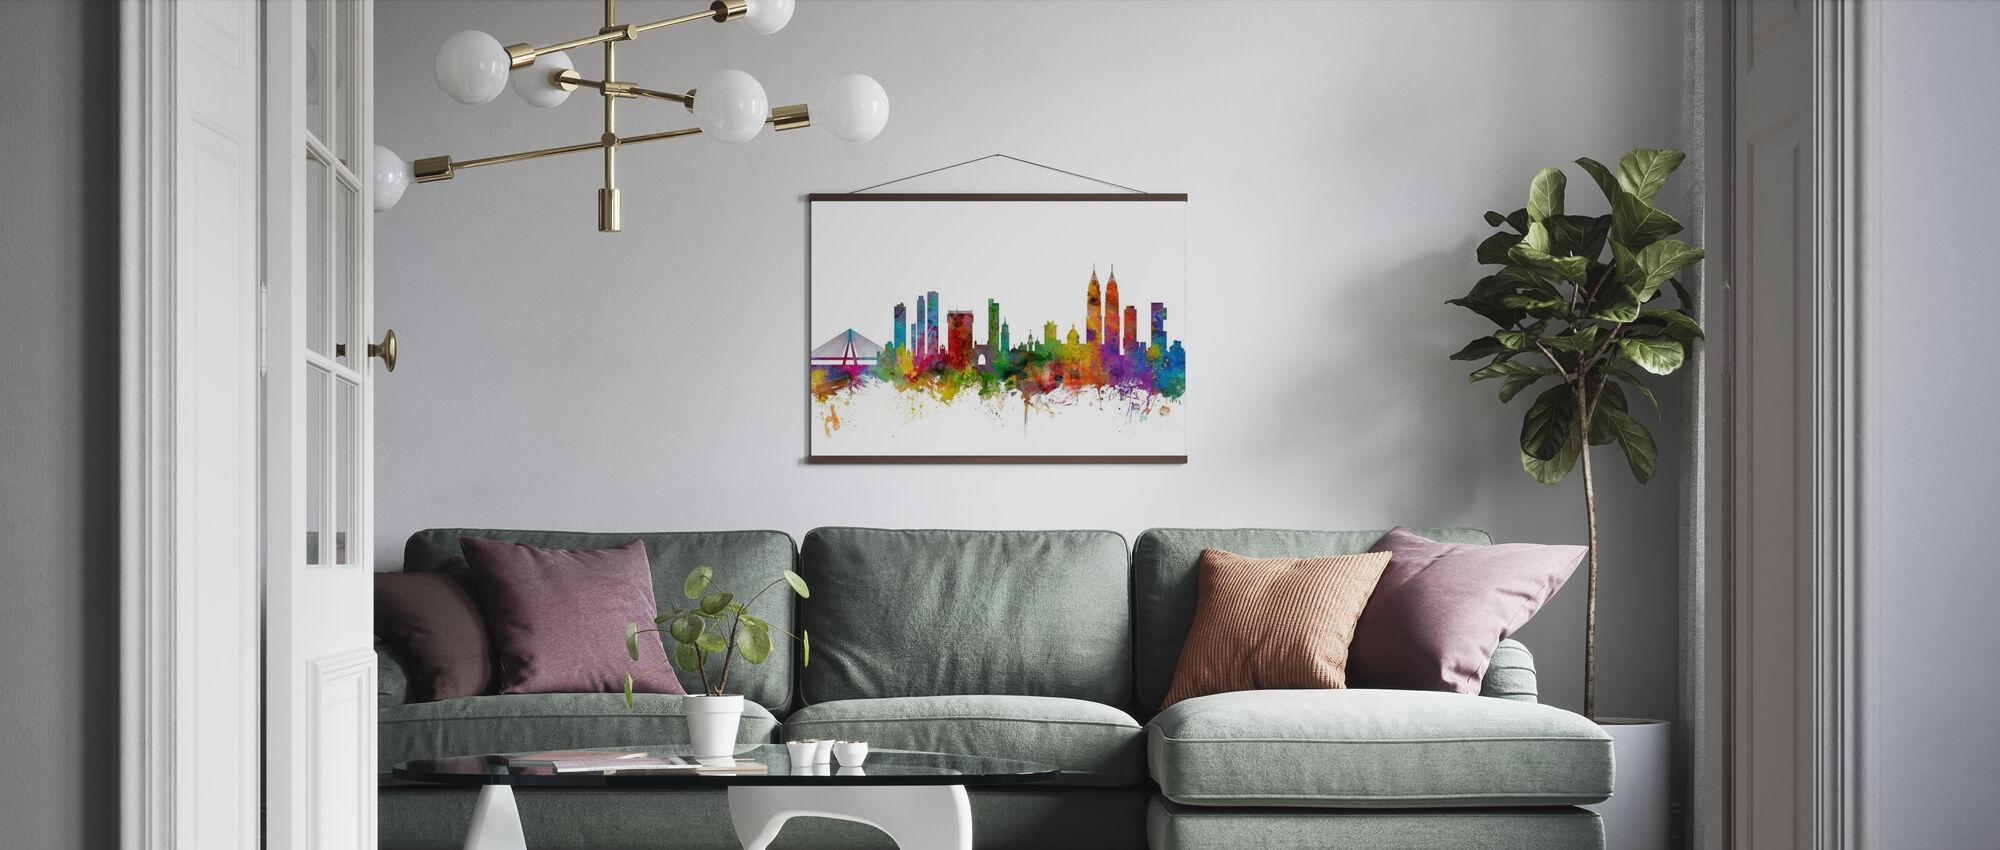 Mumbai (Bombay) Skyline - Poster - Living Room